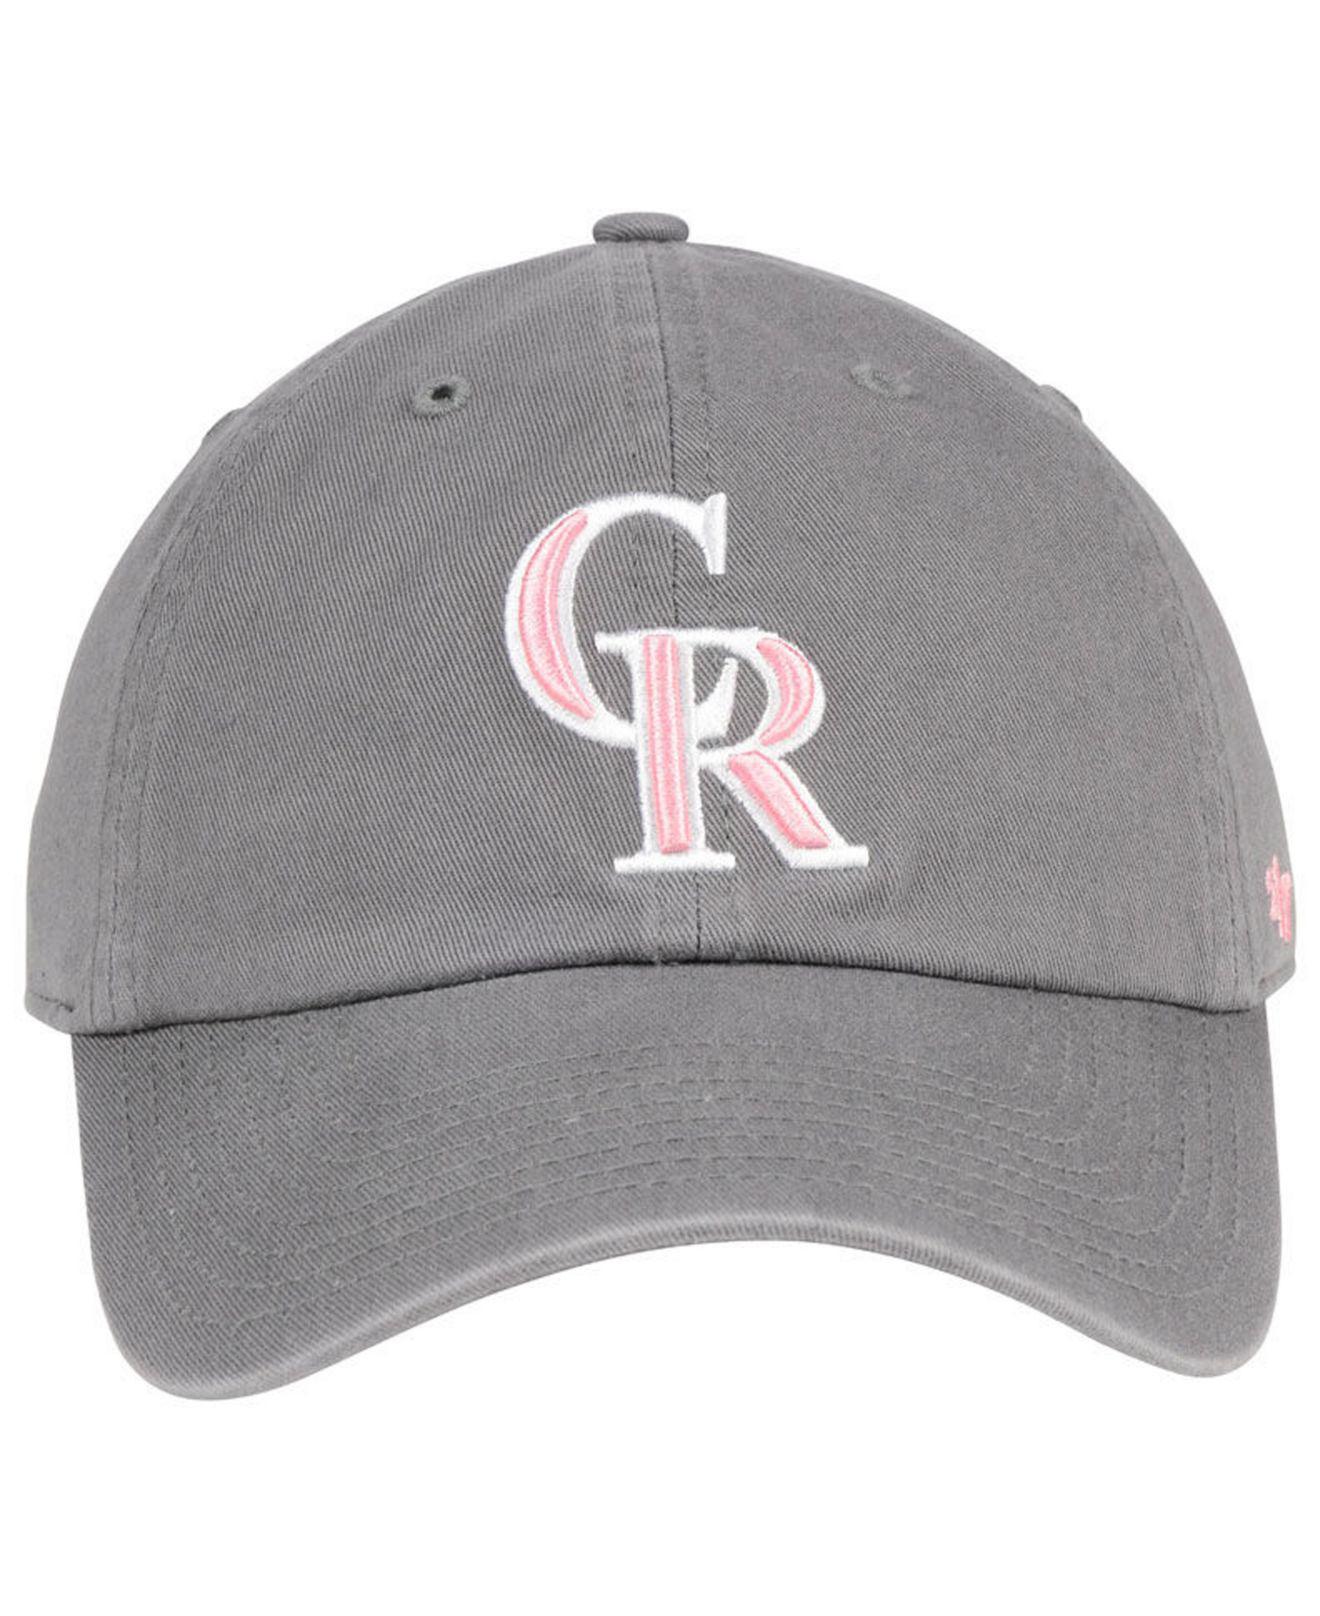 newest 3e180 65c0e ... closeout lyst 47 brand colorado rockies dark gray pink clean up cap in  gray 53738 eb8f3